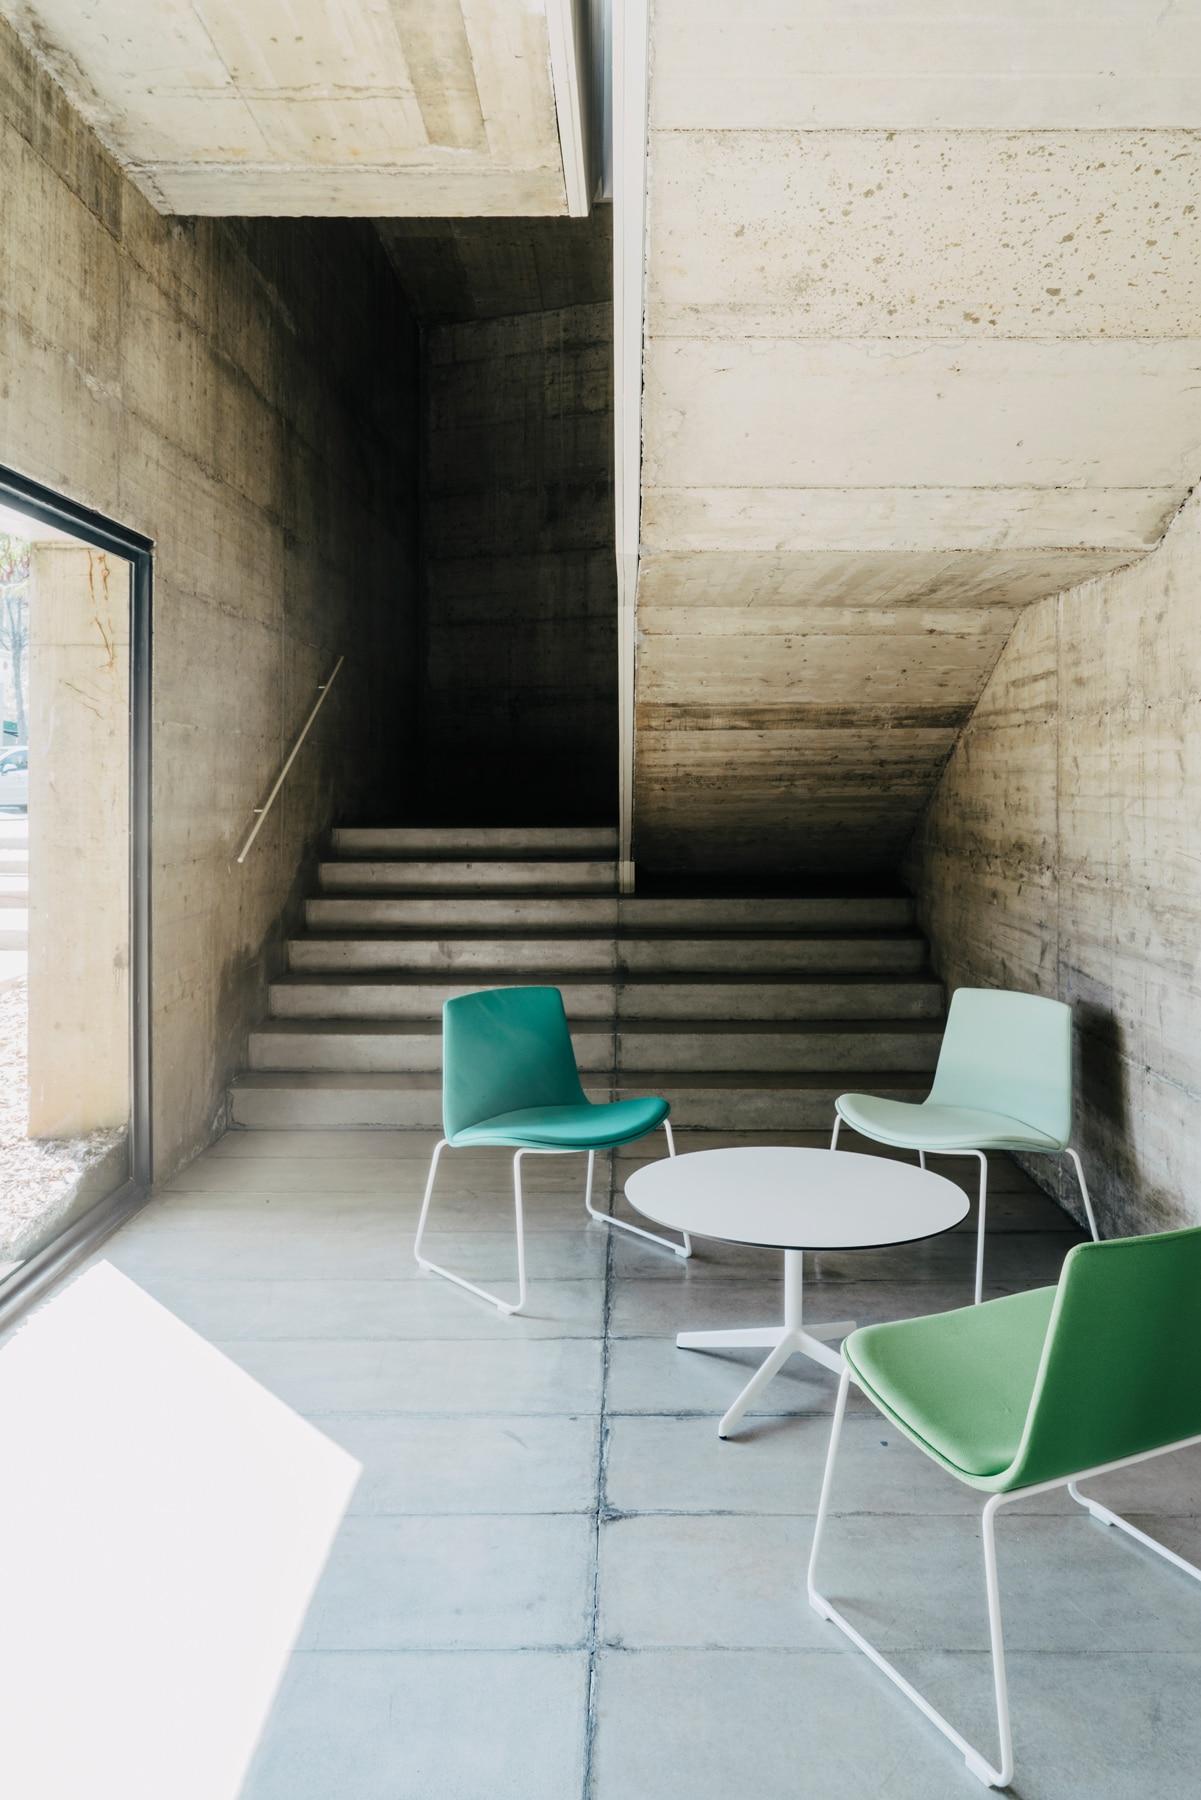 Lottus Lounge Fauteuil